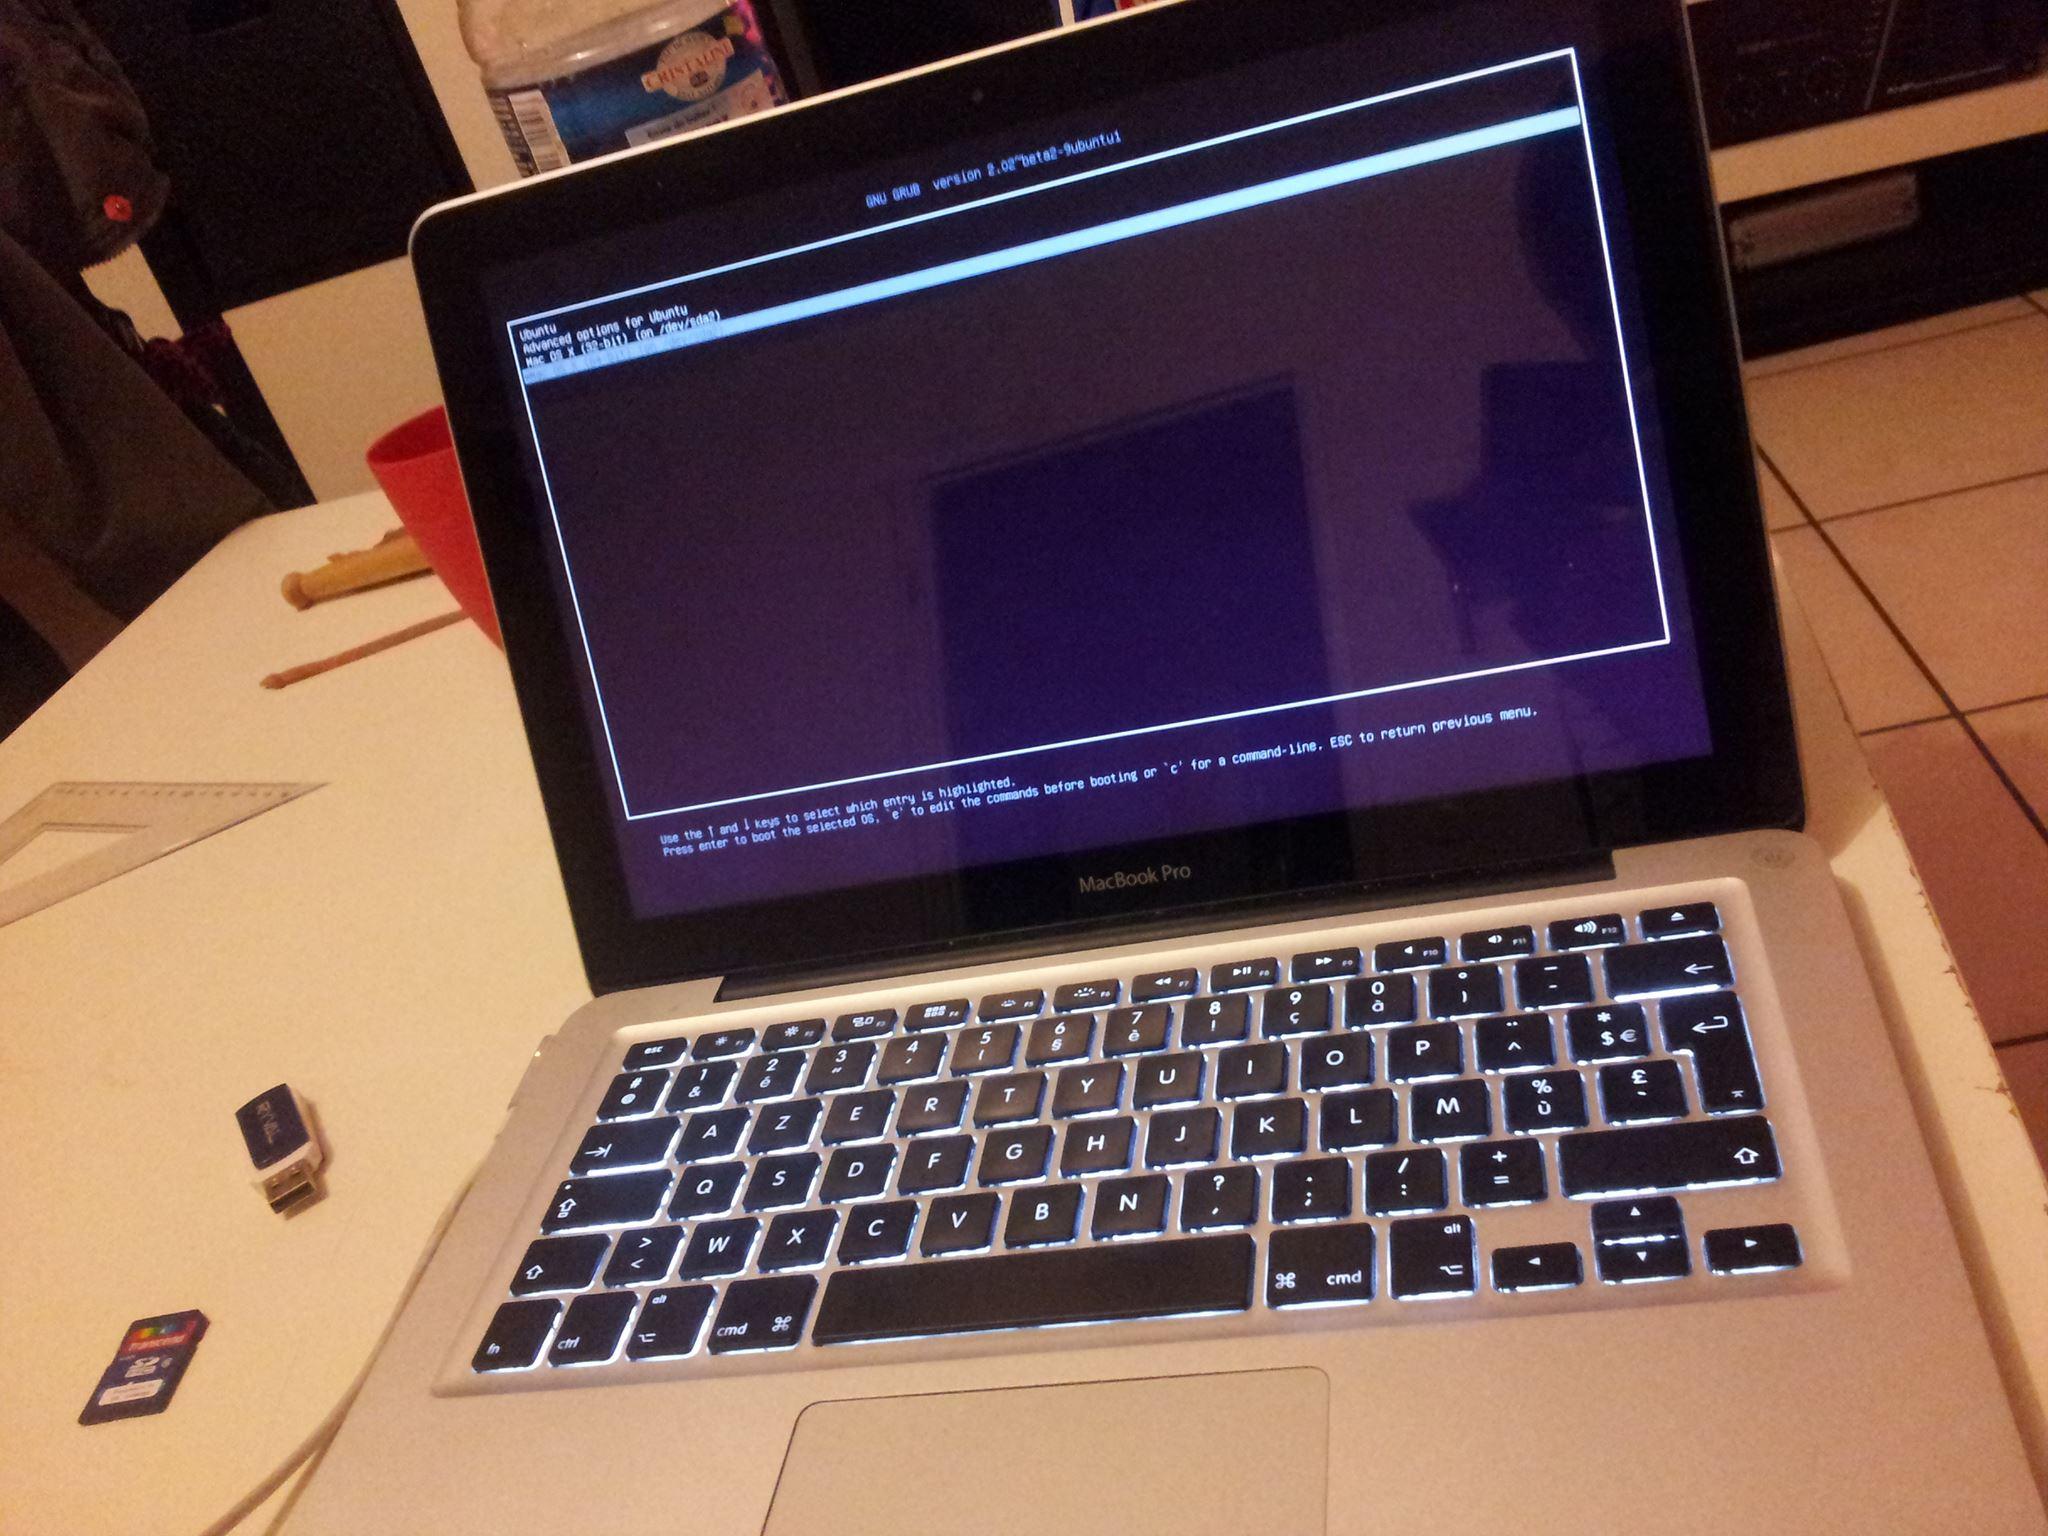 GRUB is loading ^^